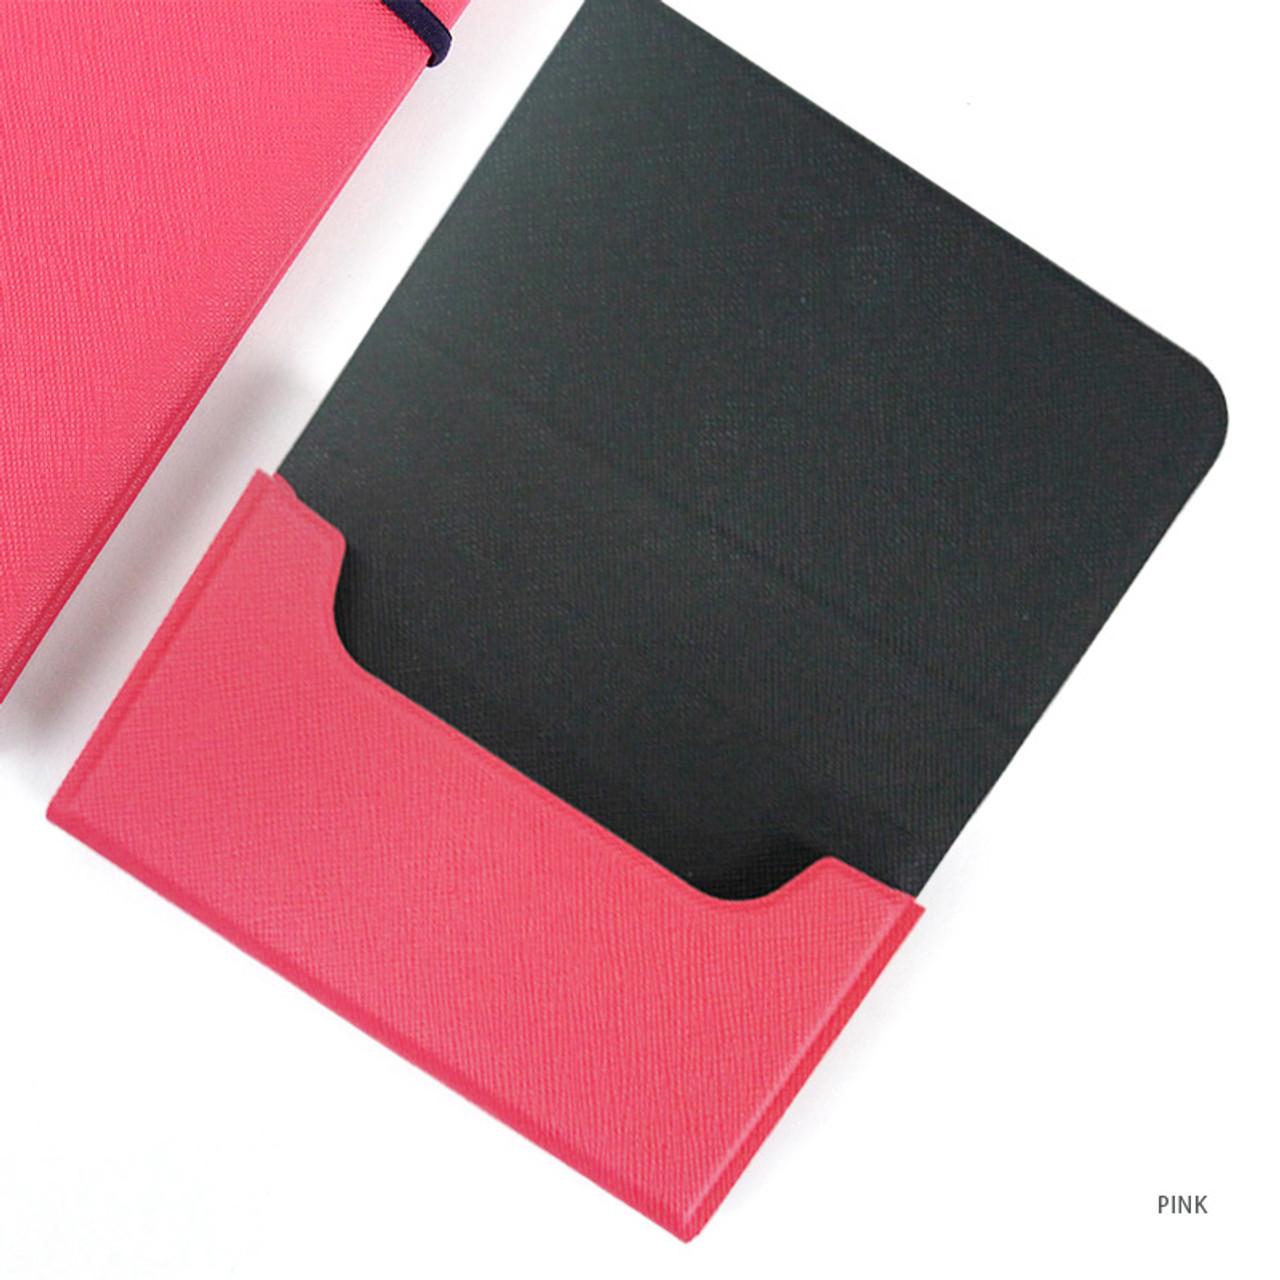 Fenice premium business card case wallet - fallindesign